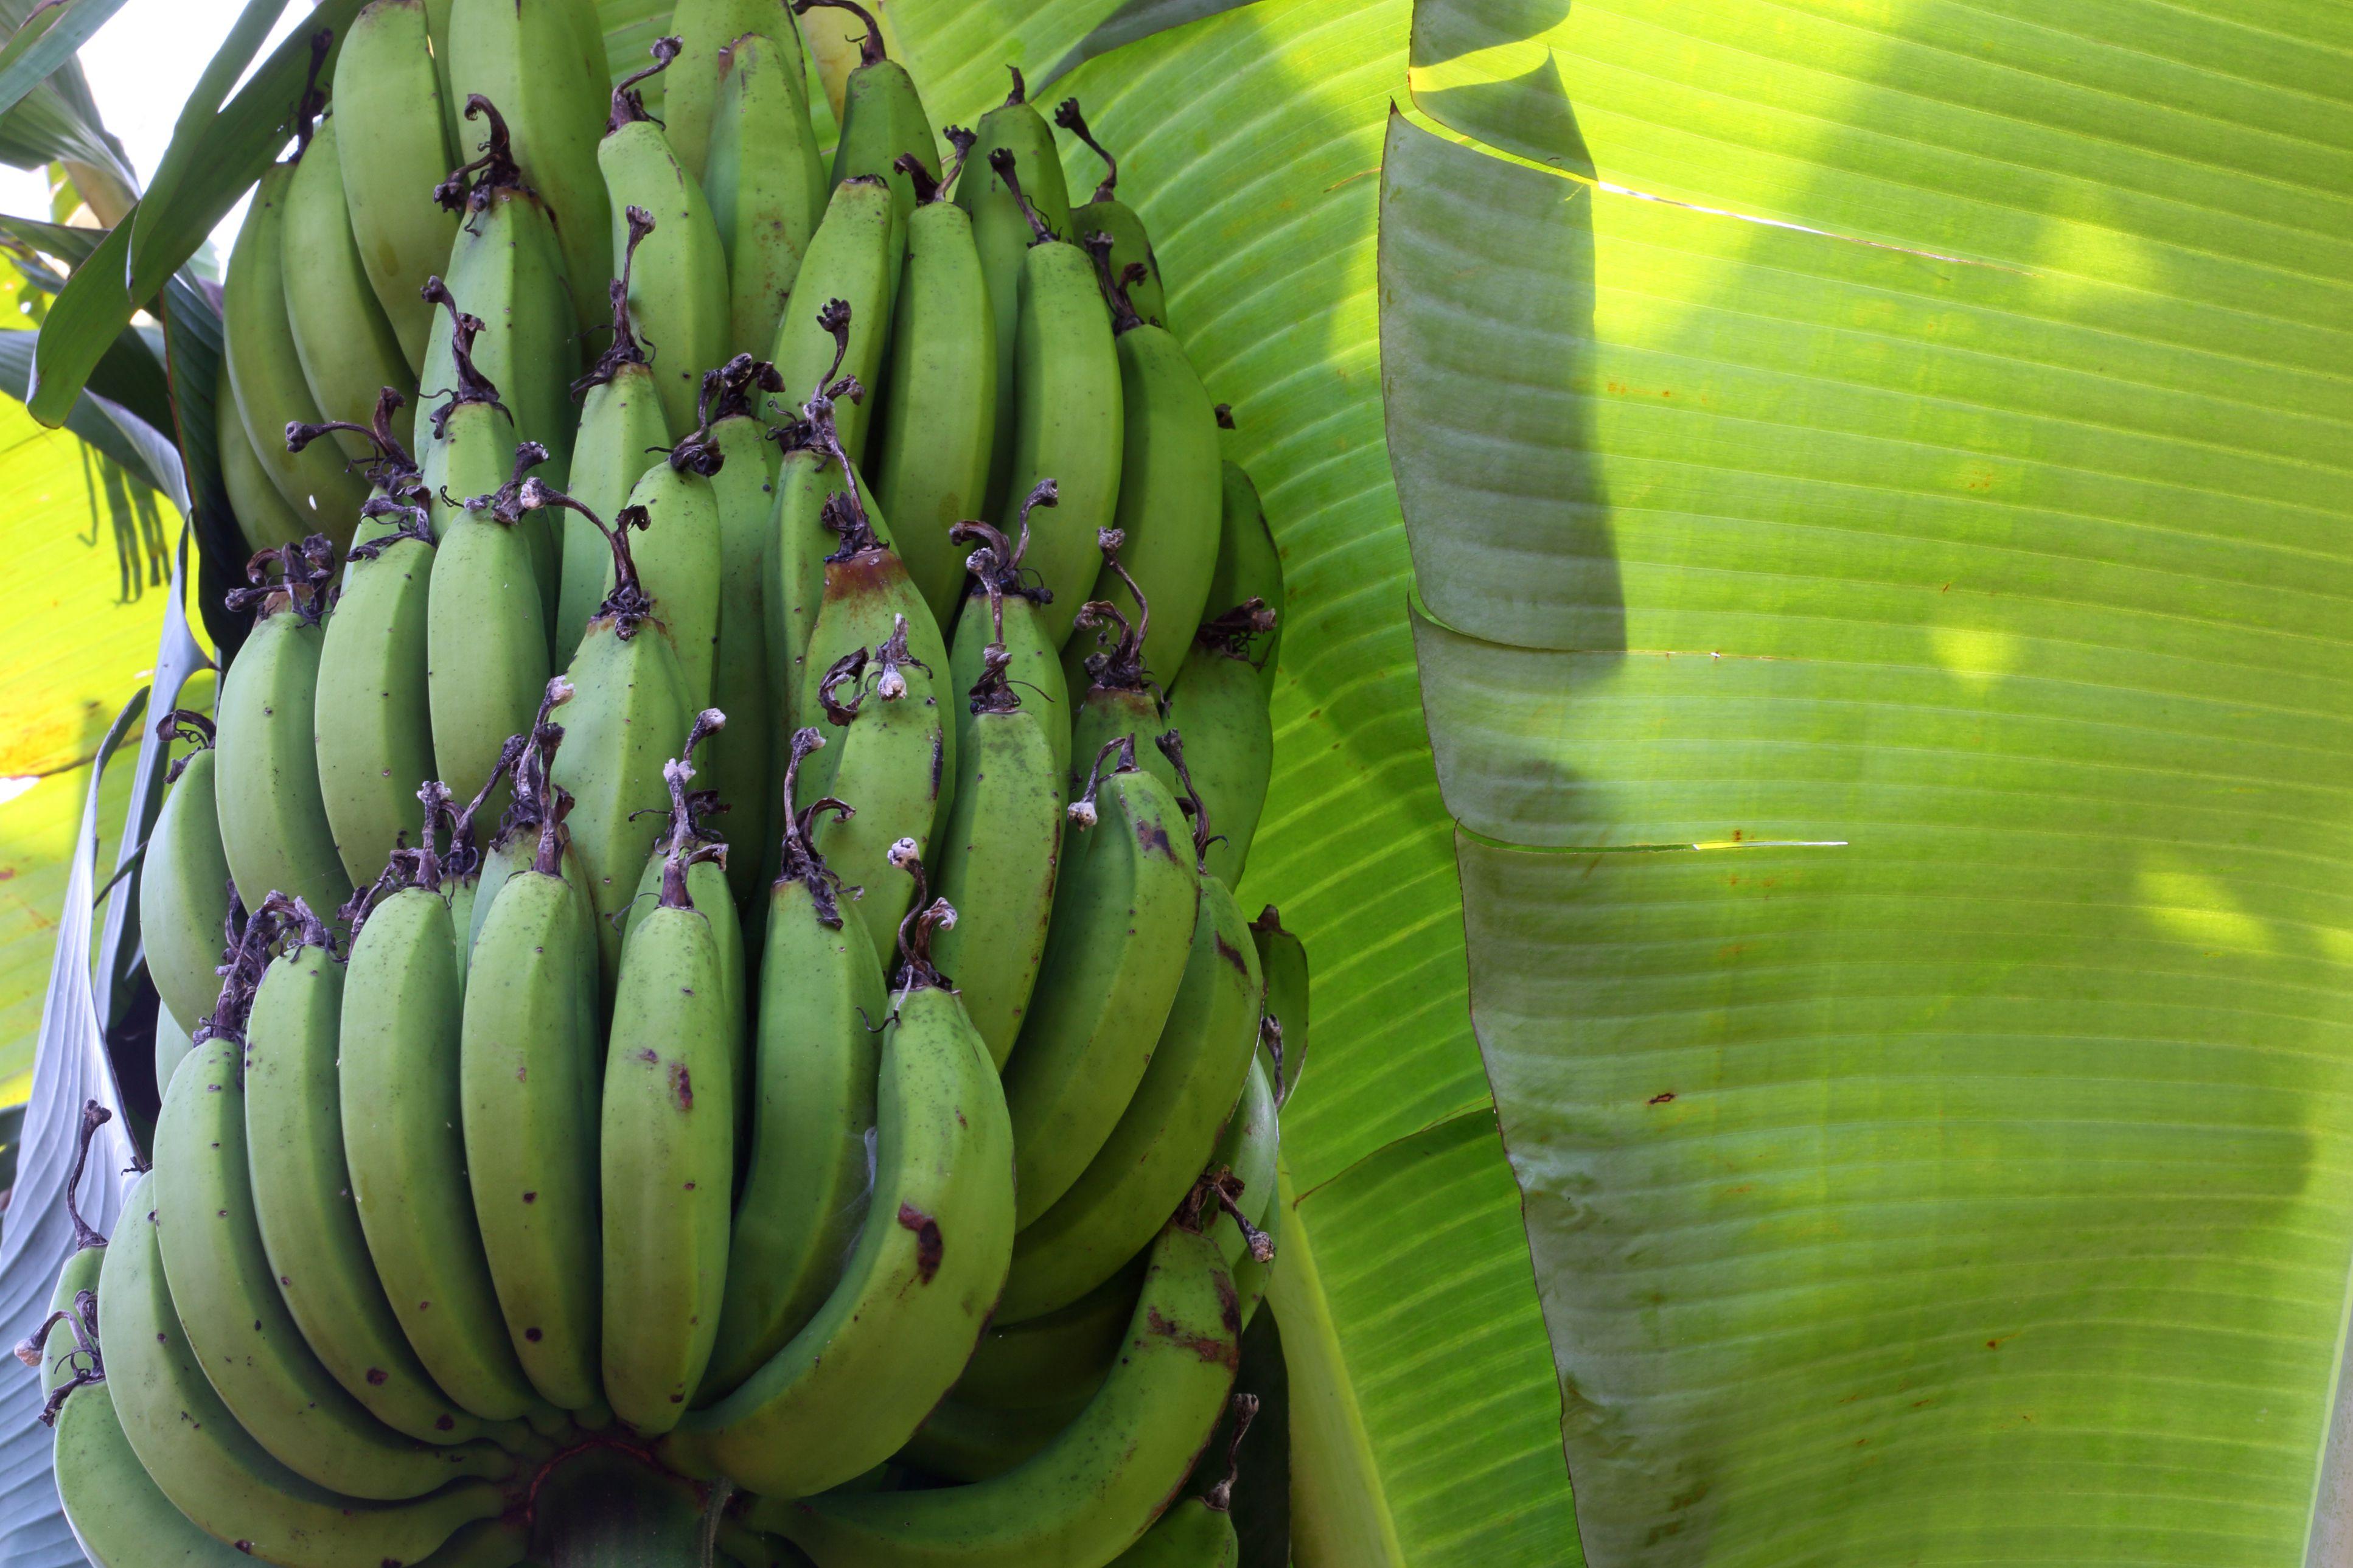 Banana tree with leaves and bananas